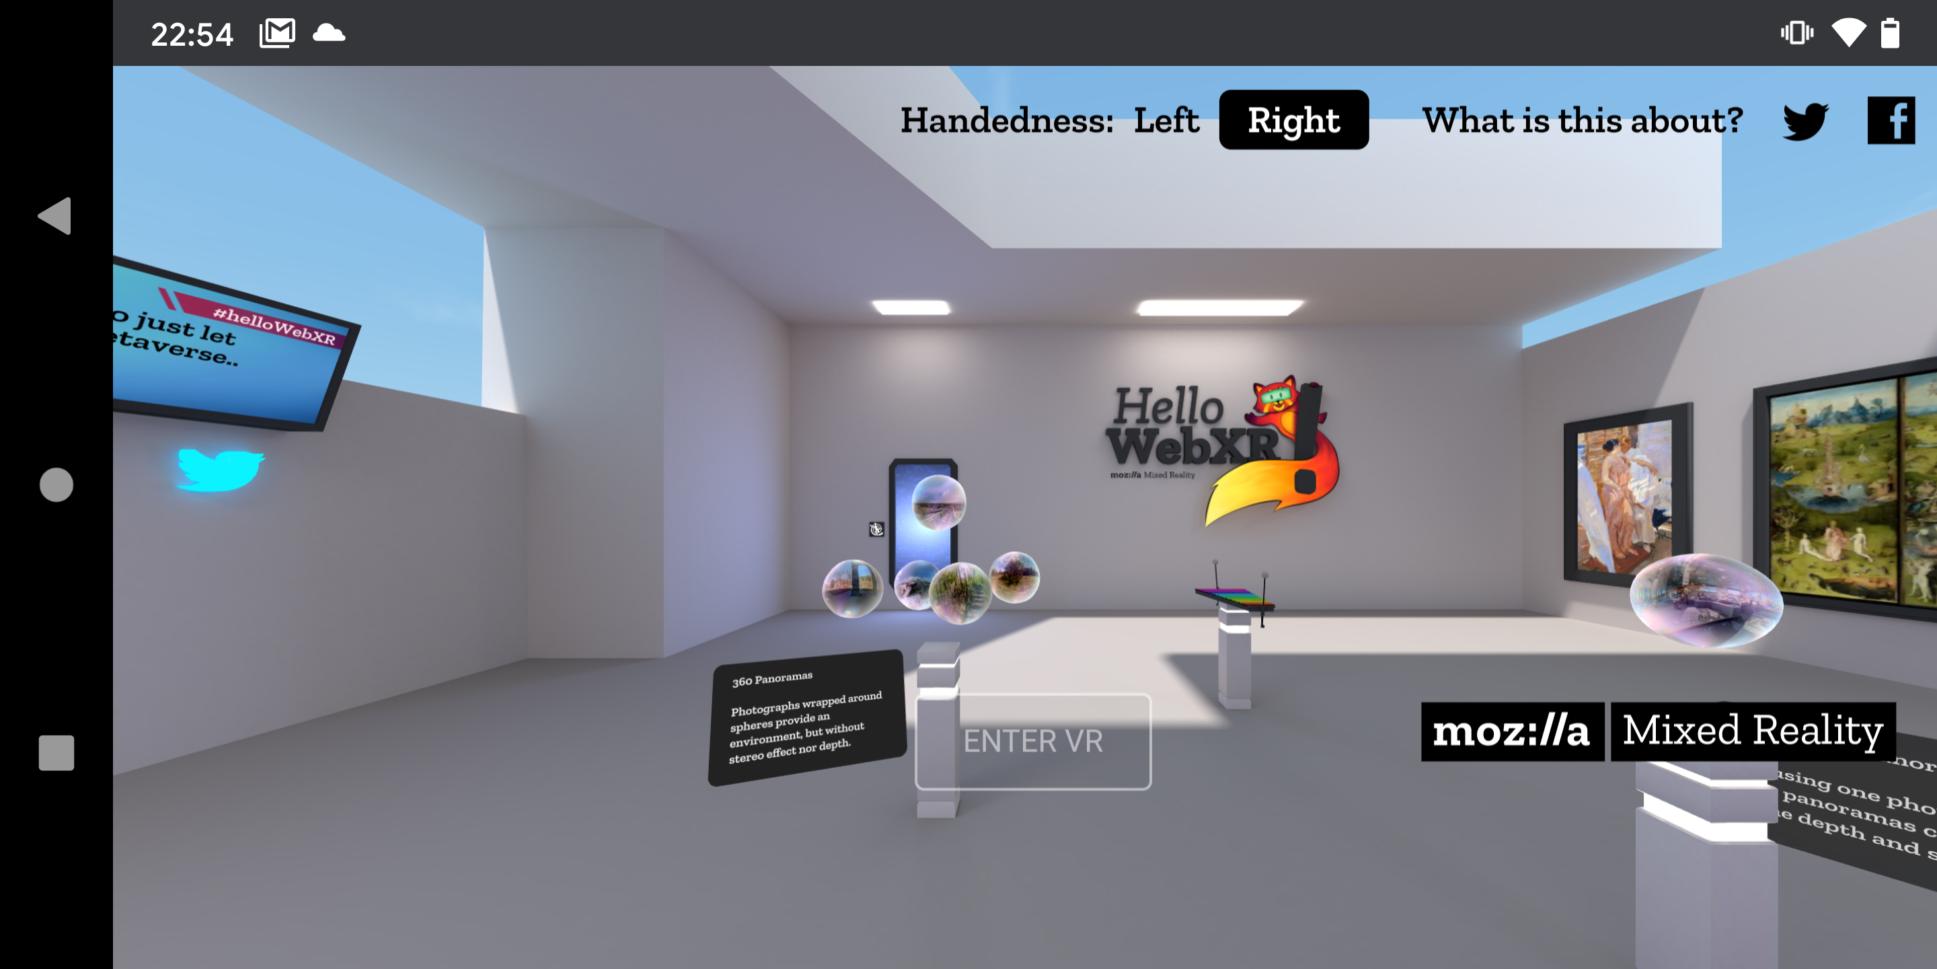 Mozilla: Hello WebXR 1